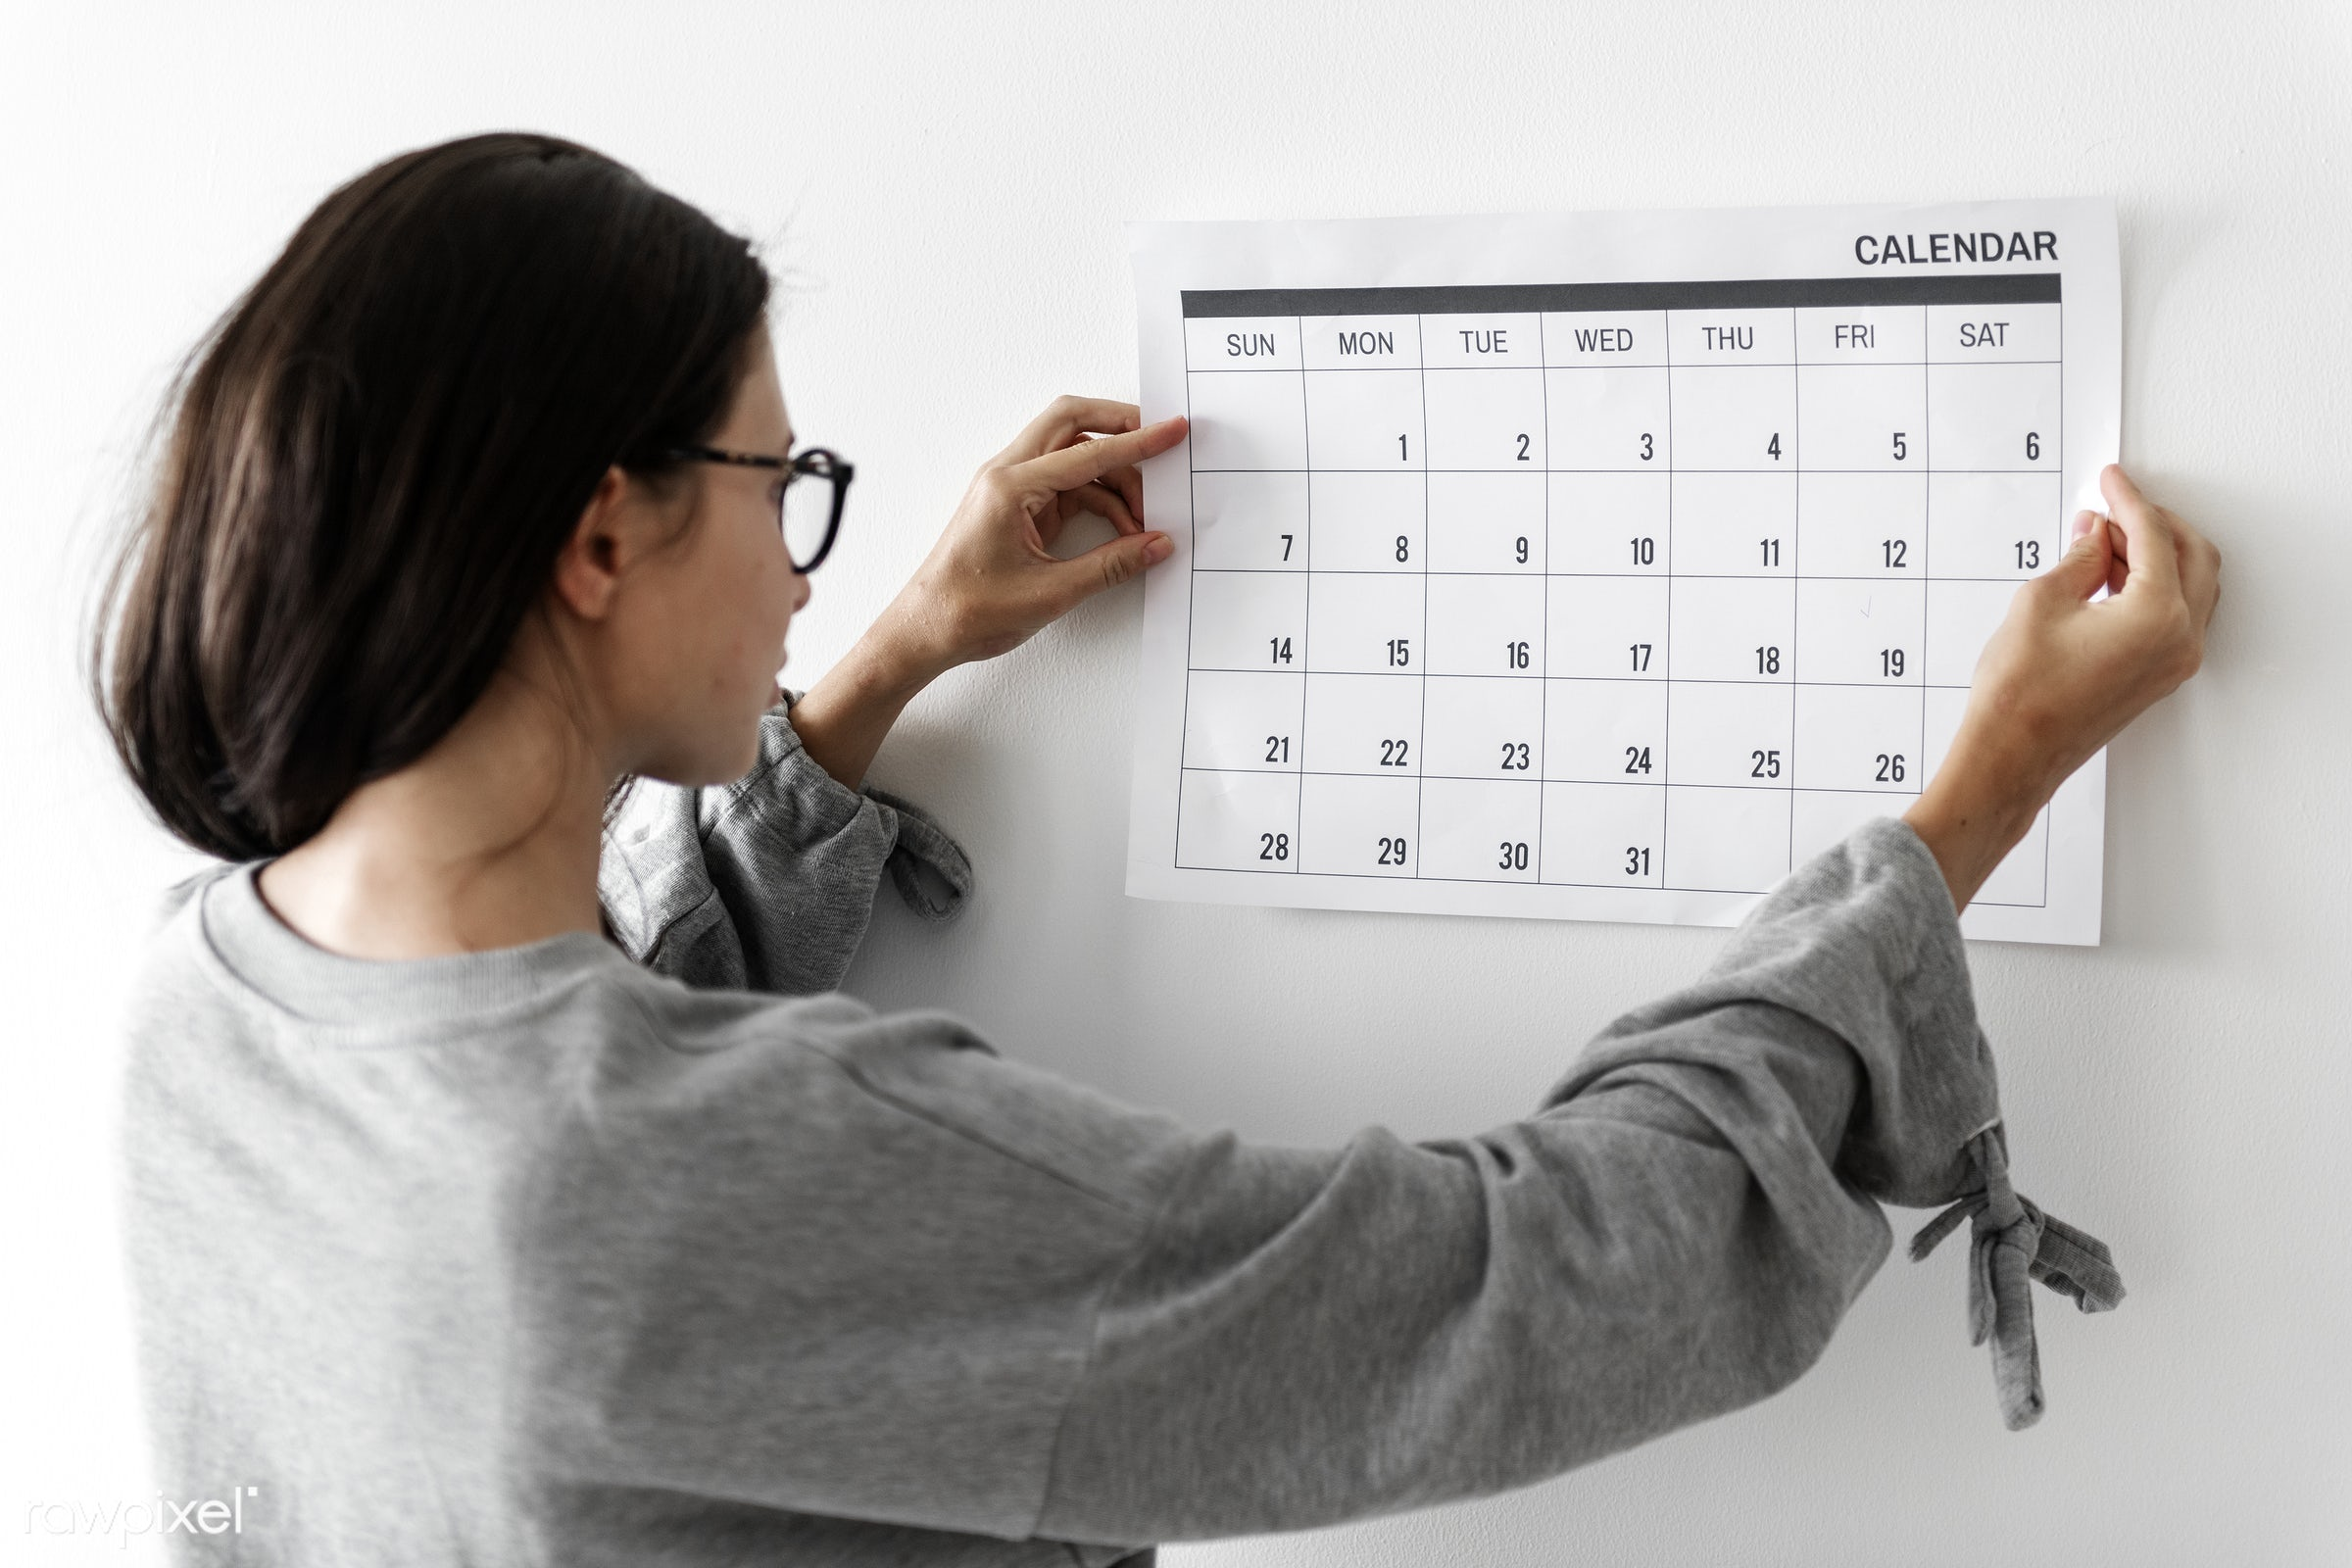 Woman checking the calendar - calendar, schedule, plan, woman, office, planning, working, note, work, planner, workplace,...